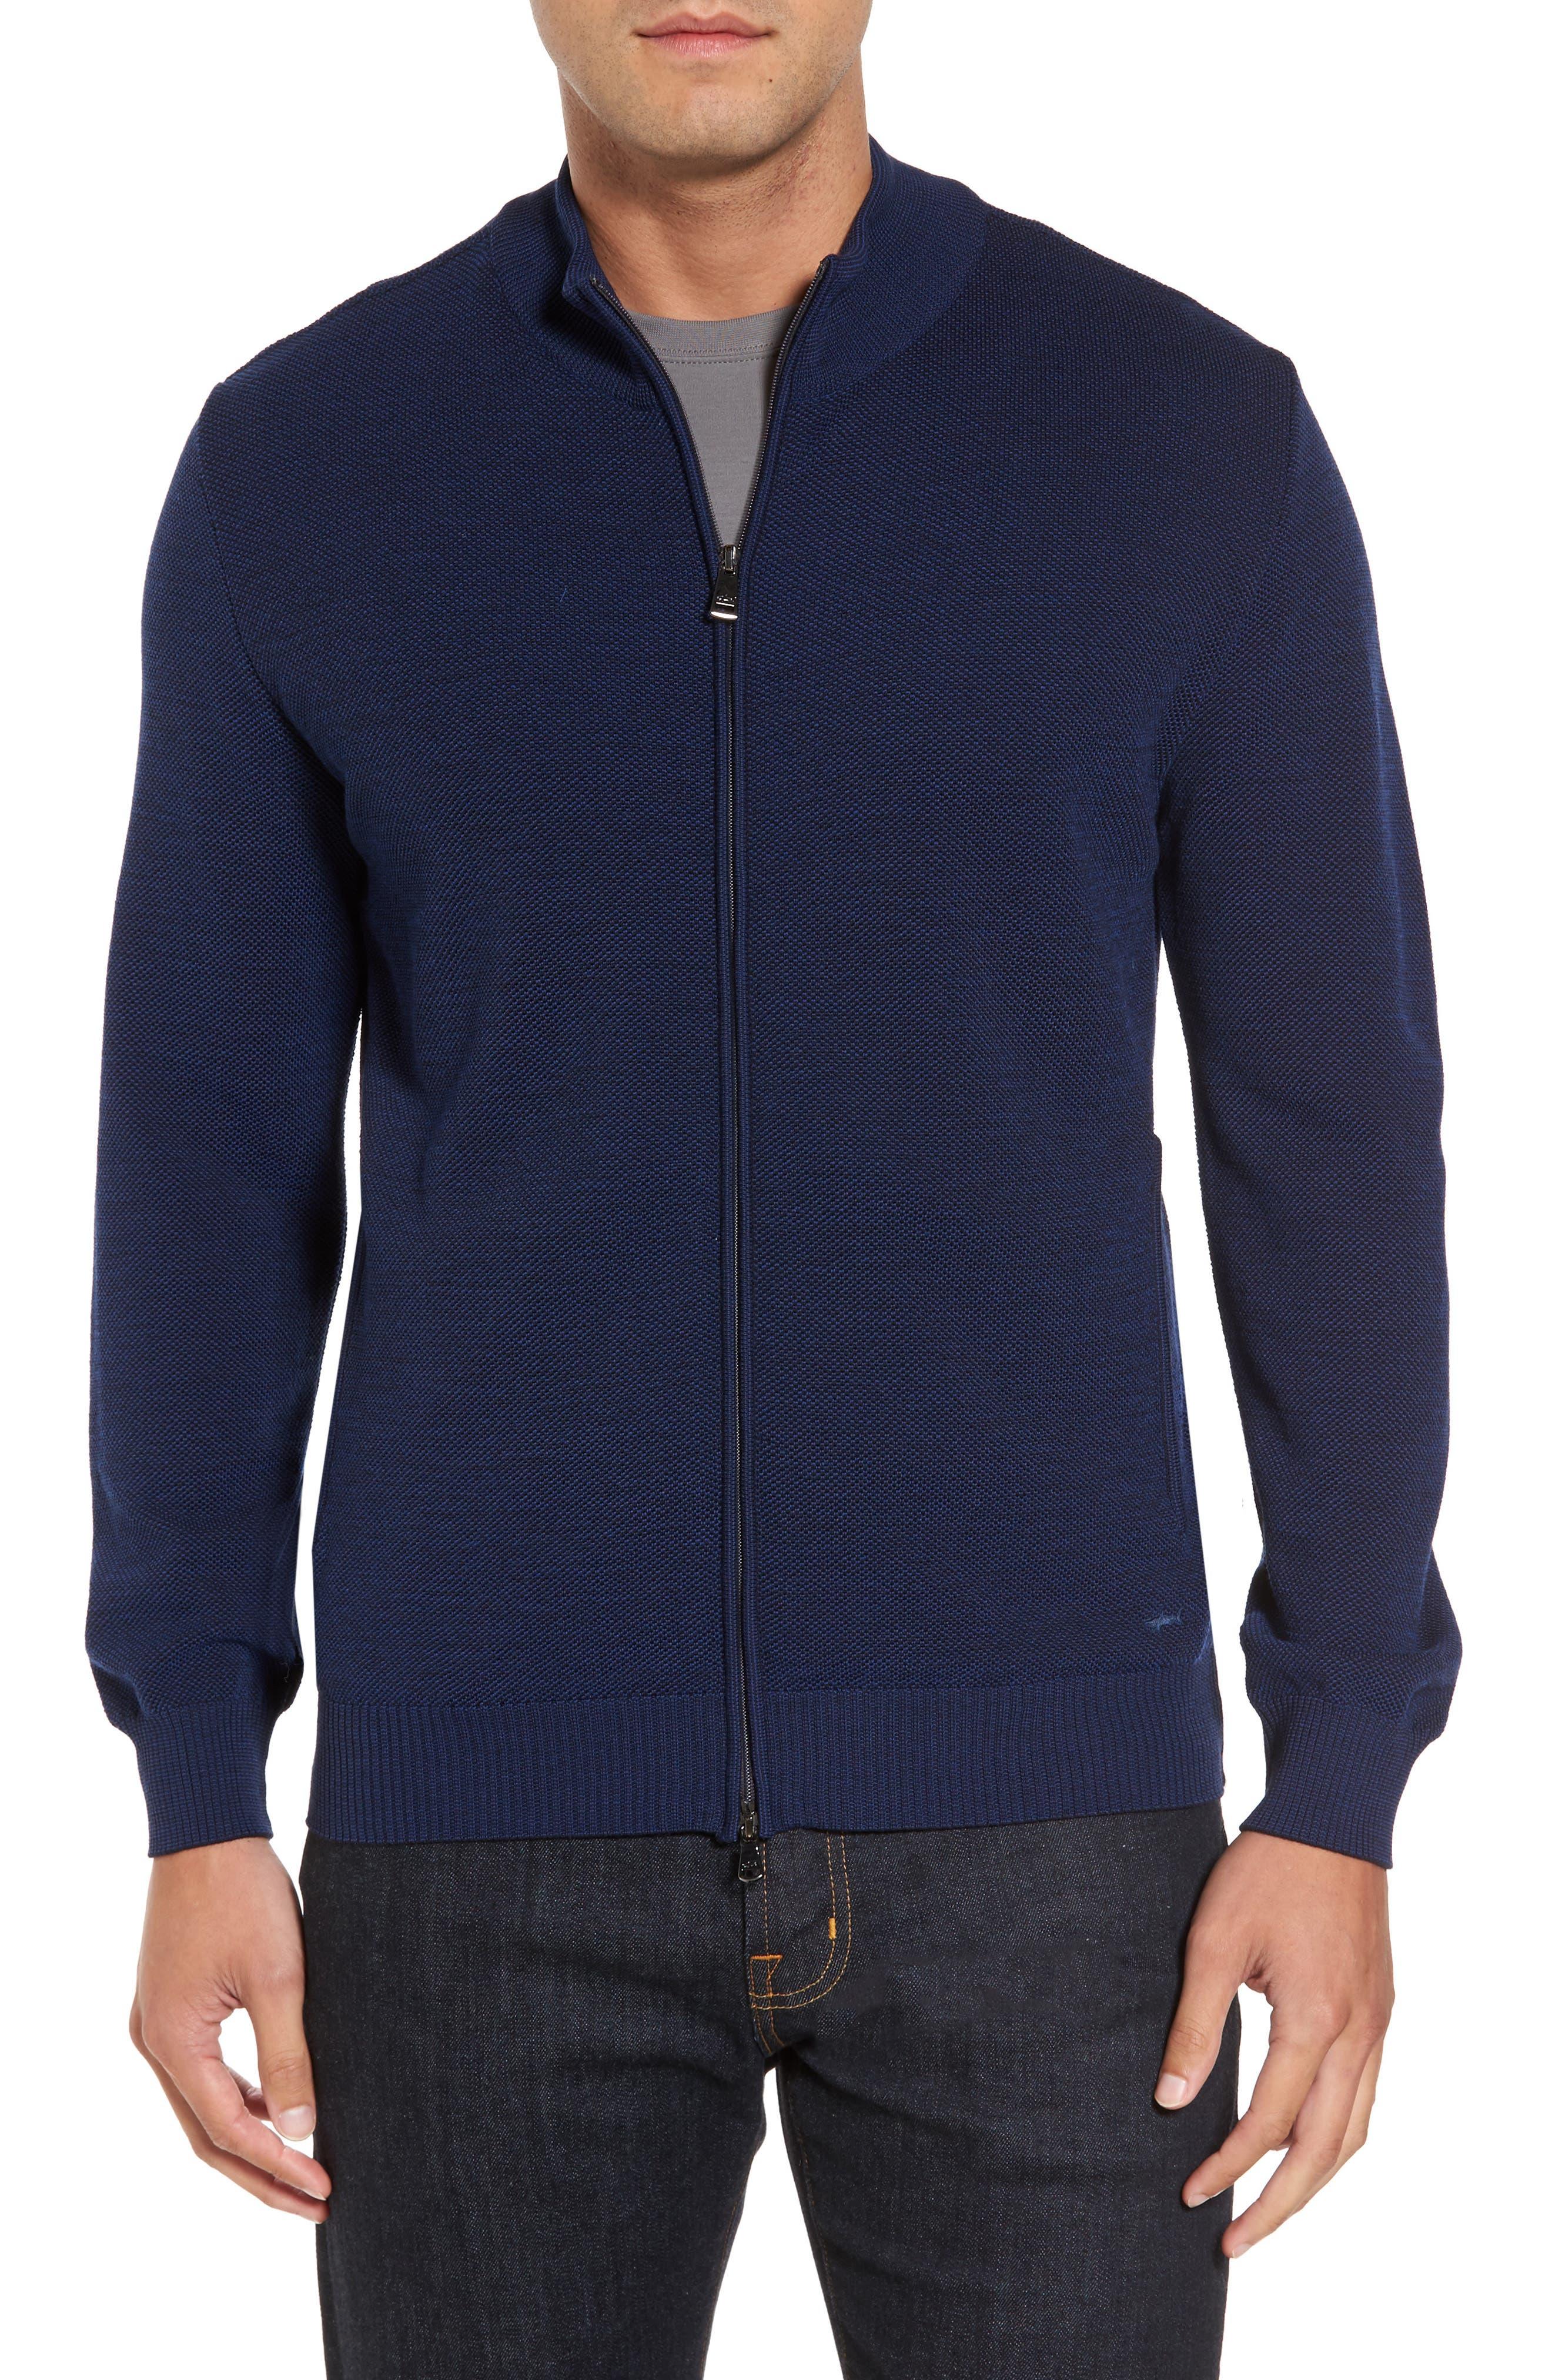 Alternate Image 1 Selected - Paul & Shark Piqué Zip Wool Sweater